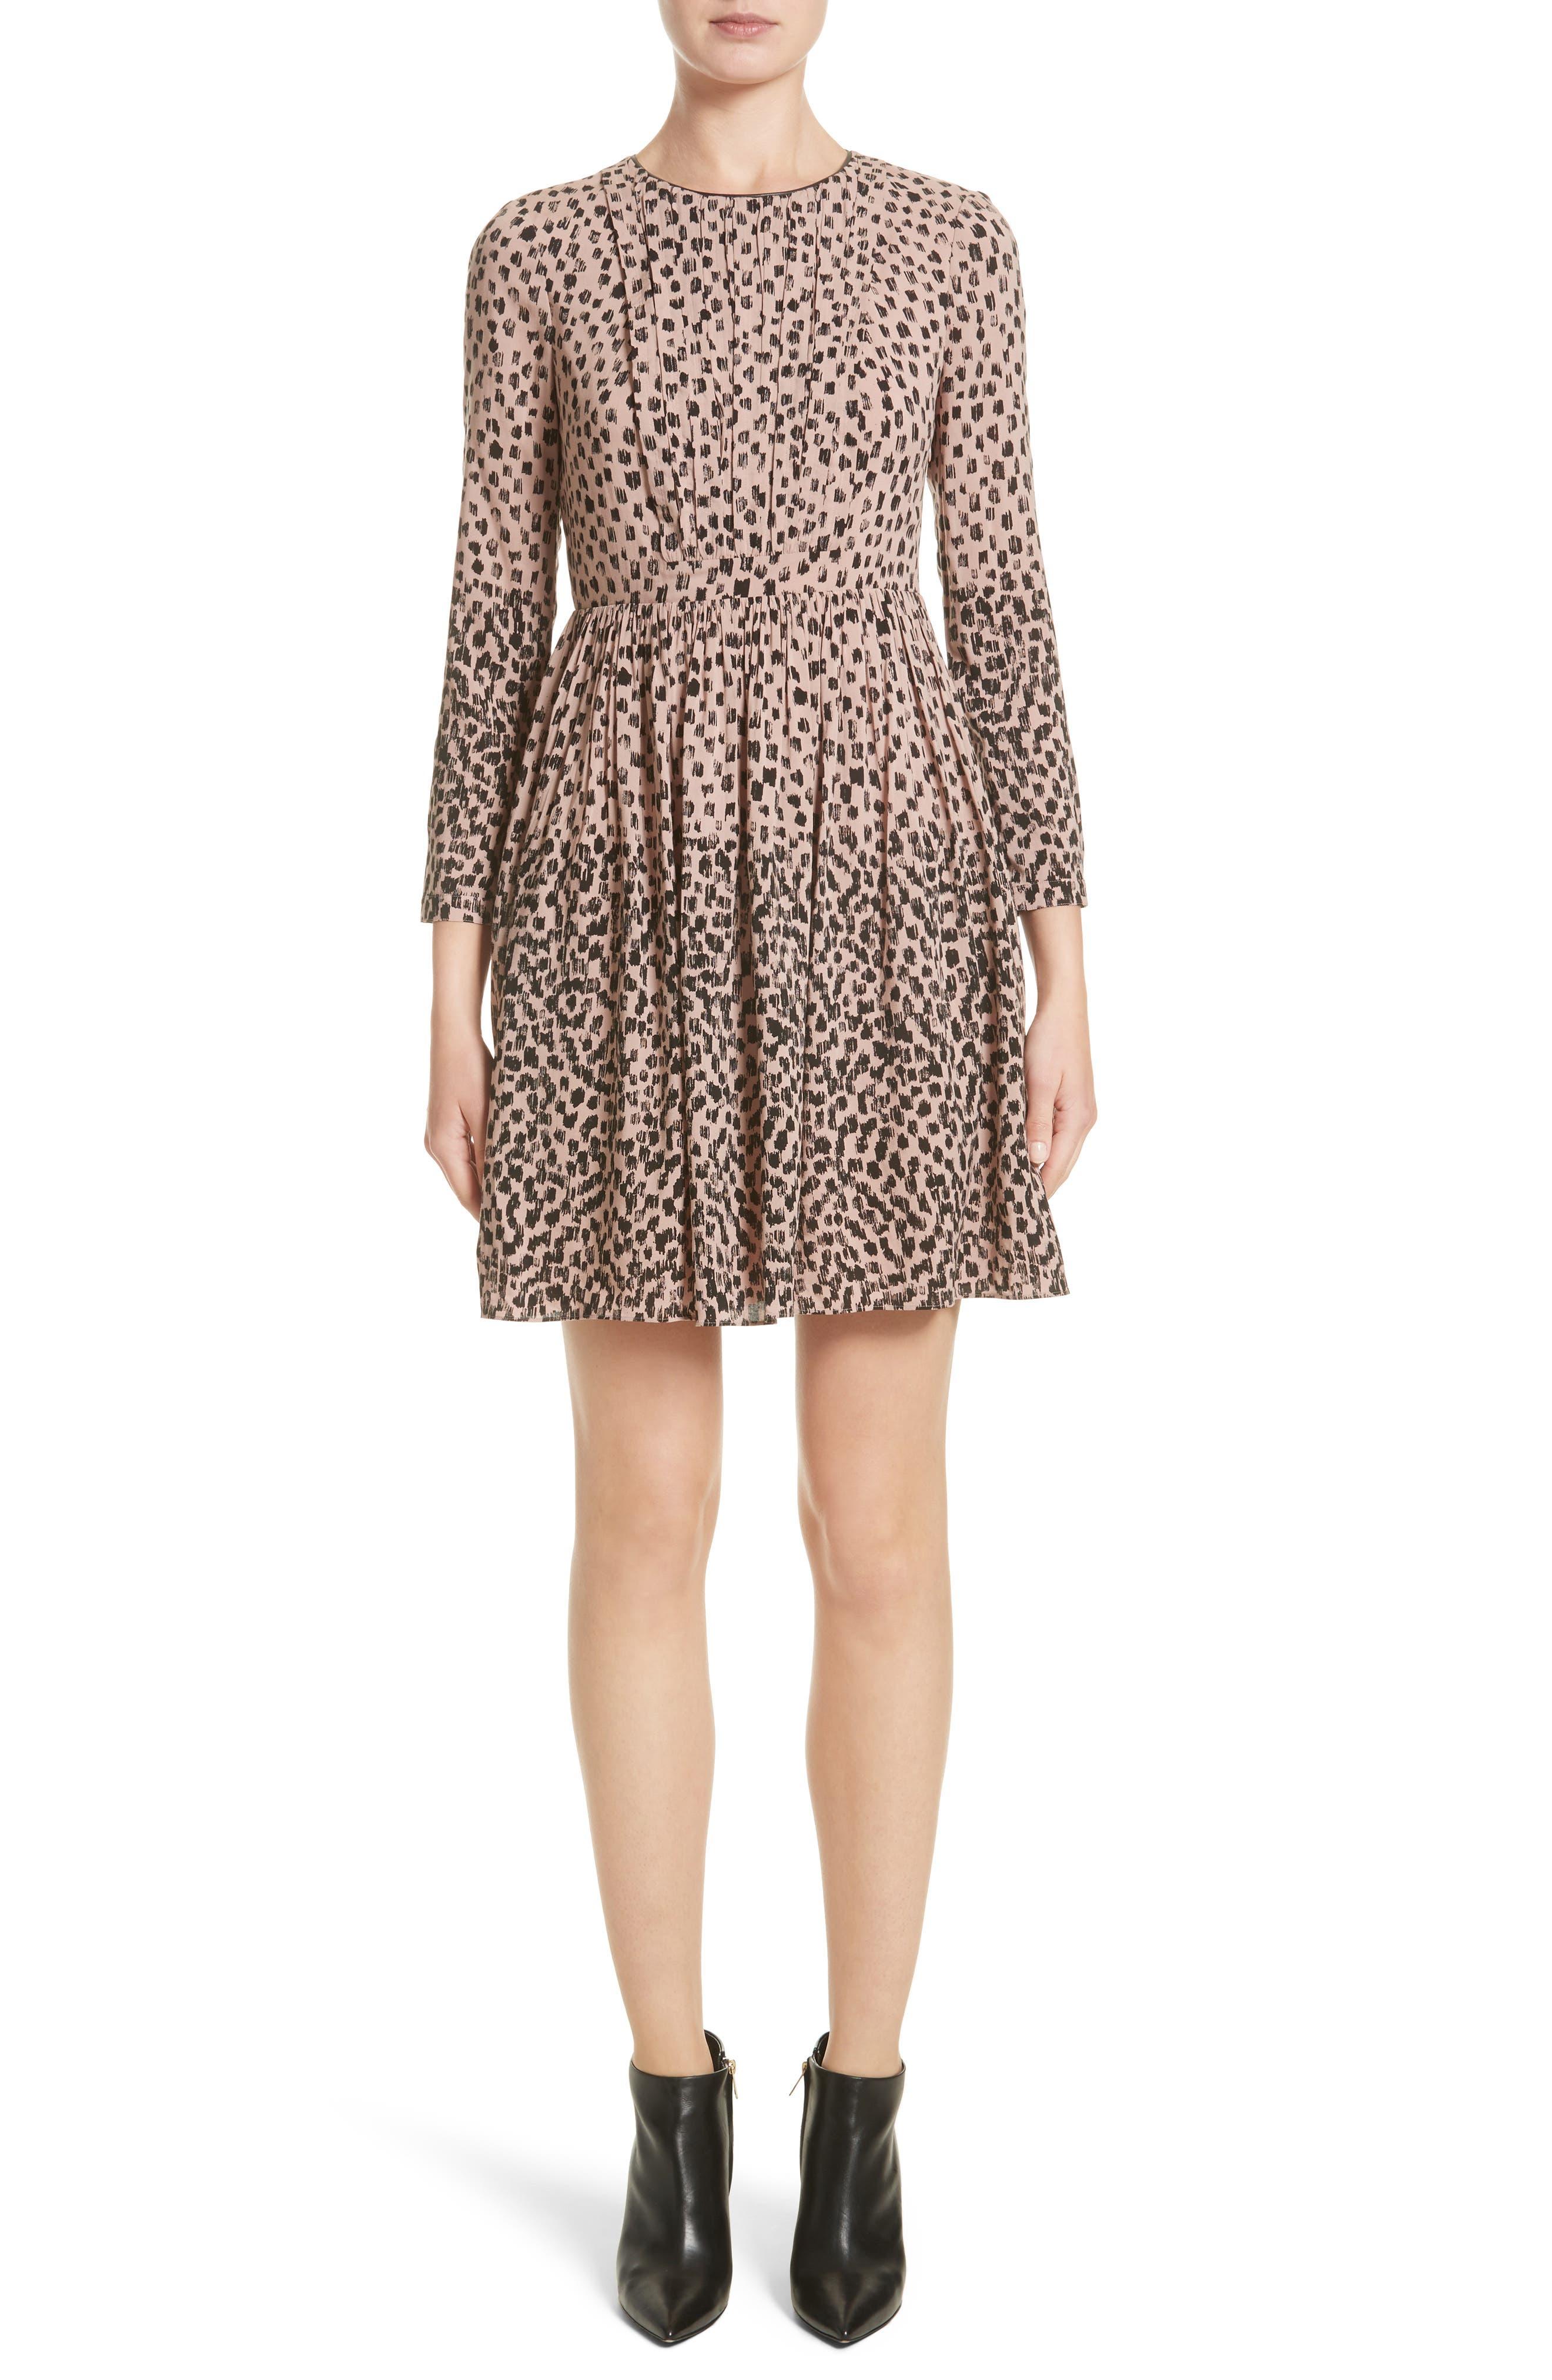 Karinkalt Leather Trim Print Dress,                         Main,                         color, 683